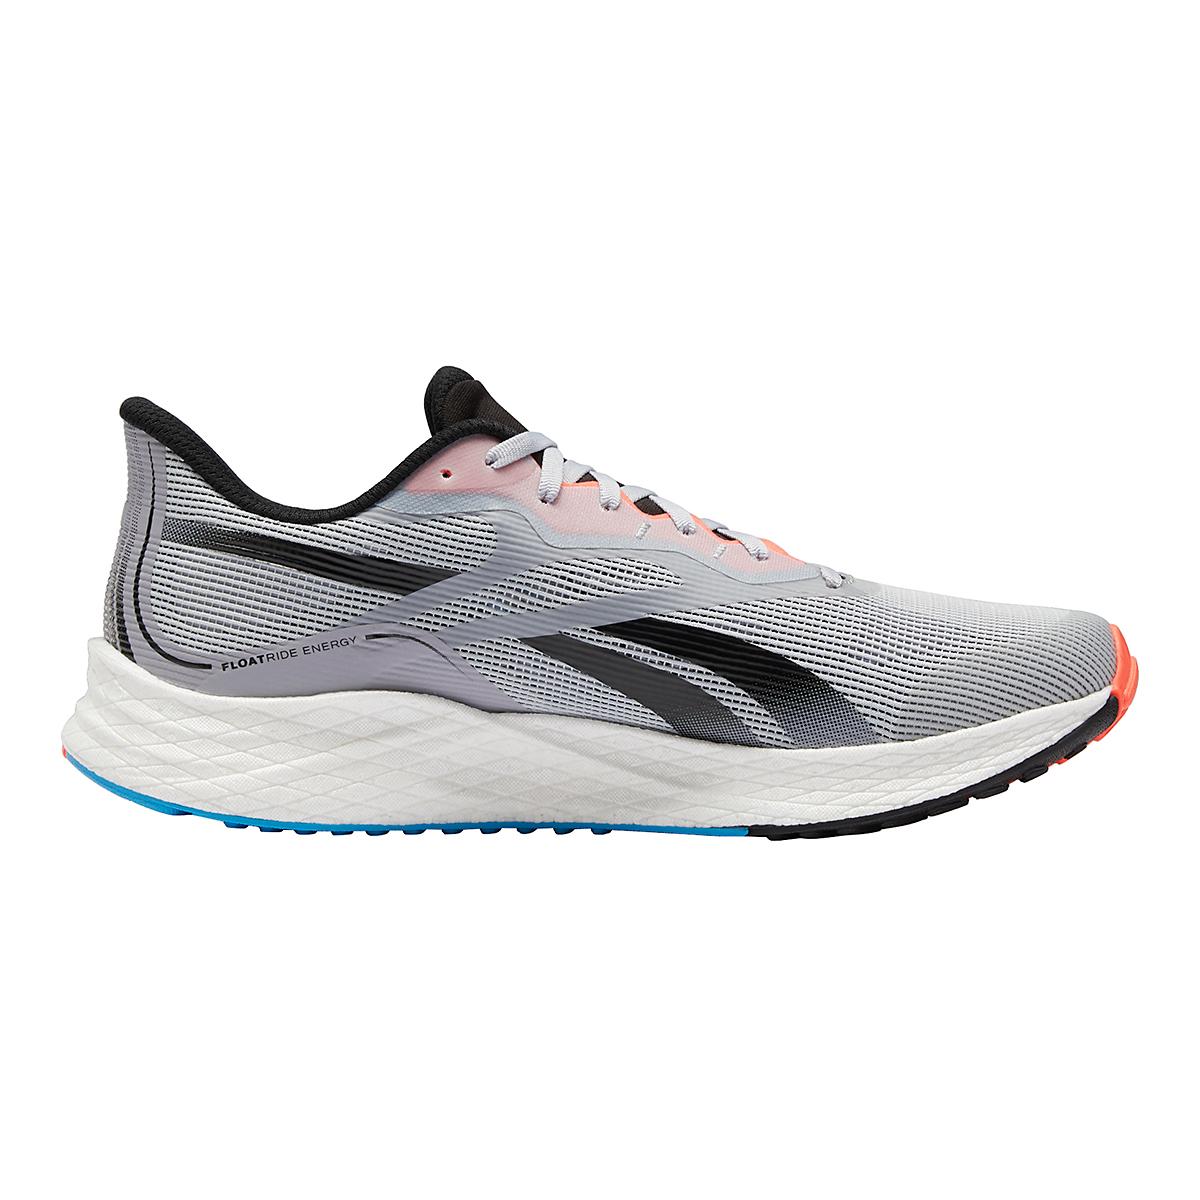 Men's Reebok Floatride Energy 3.0 Running Shoe - Color: Cold Grey/Core Black/Orange Flare - Size: 7 - Width: Regular, Cold Grey/Core Black/Orange Flare, large, image 1